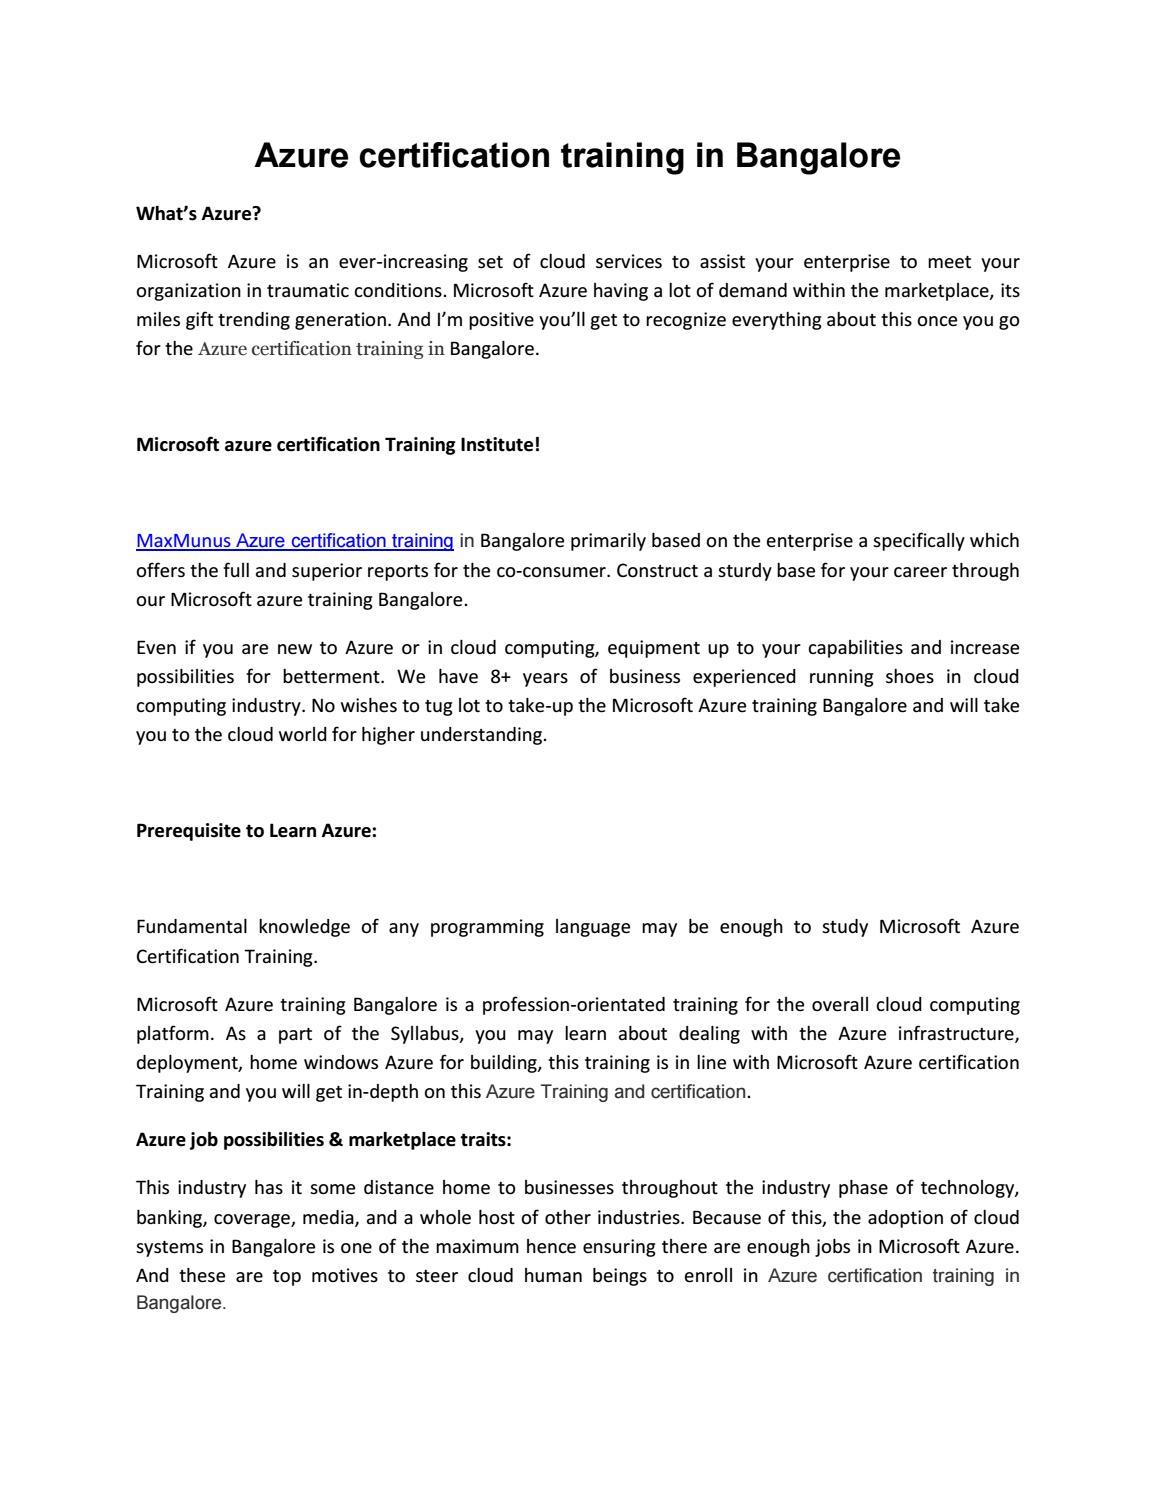 Azure Classroom Training By Maxmunus6 Issuu